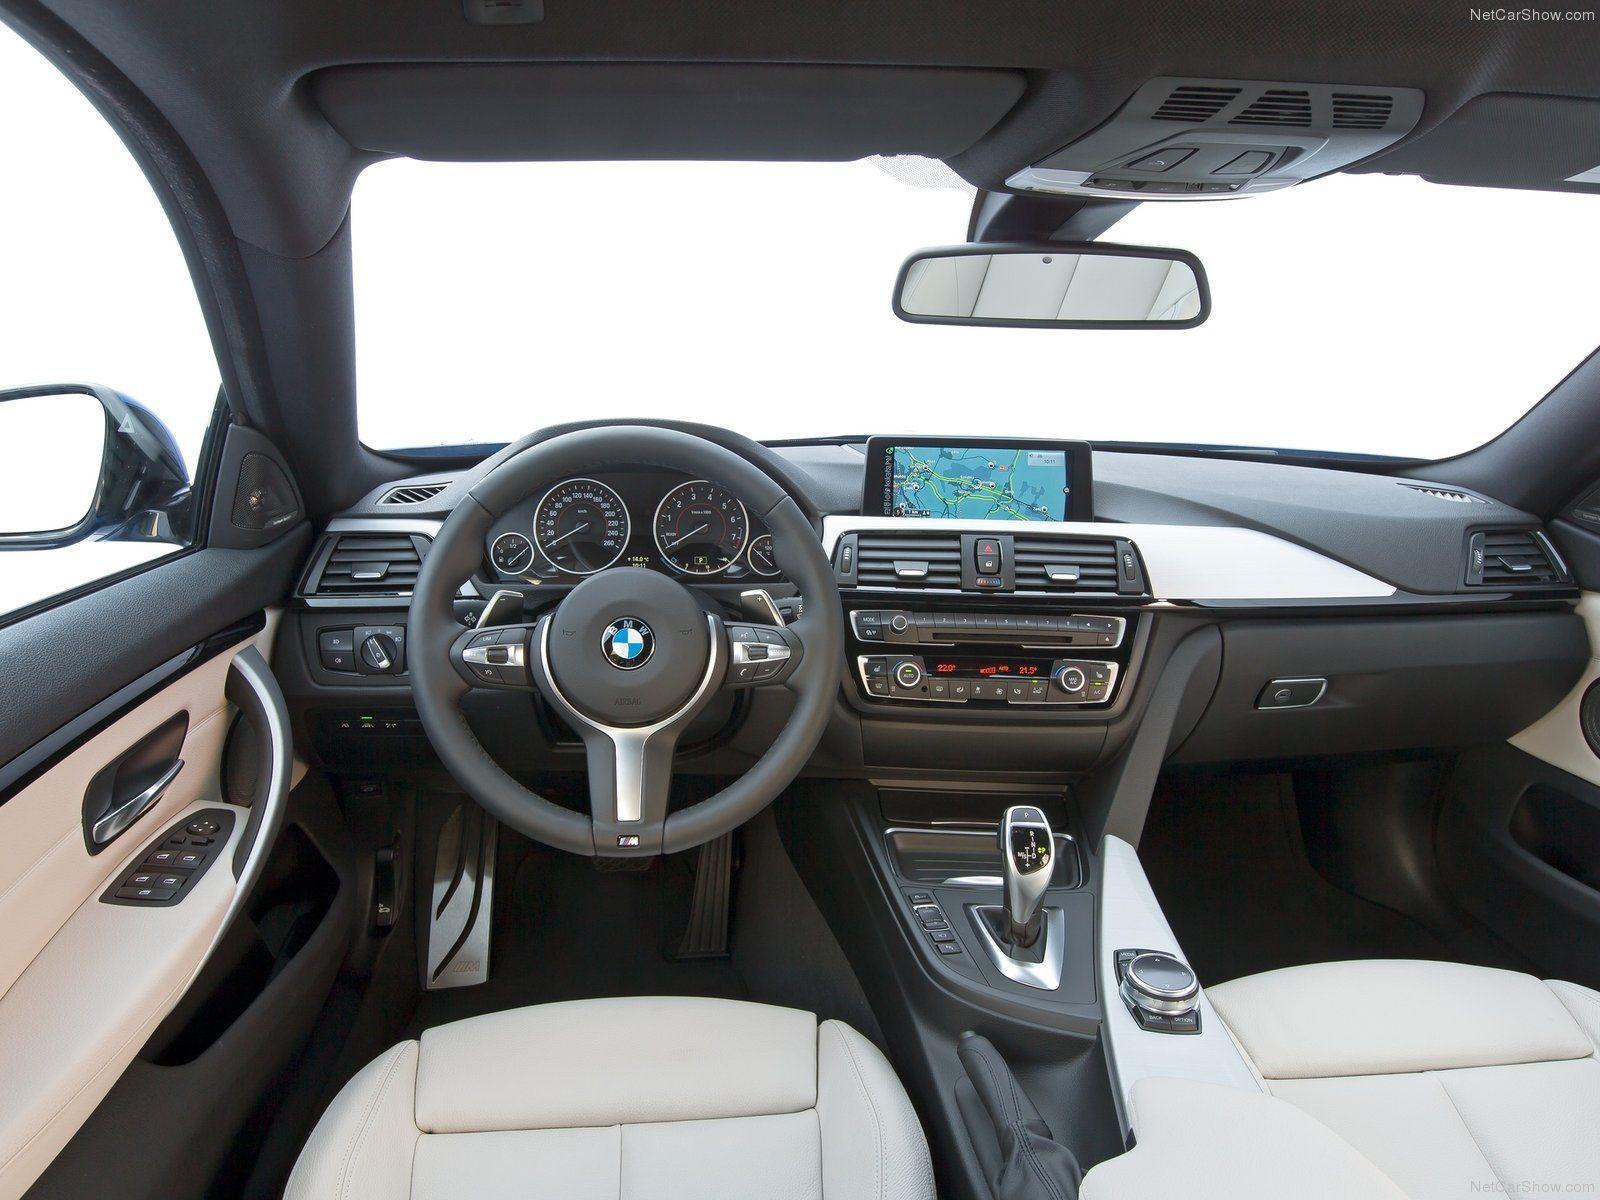 bmw 2015 5 series interior. 2015 bmw 5 series intreior images bmw interior i